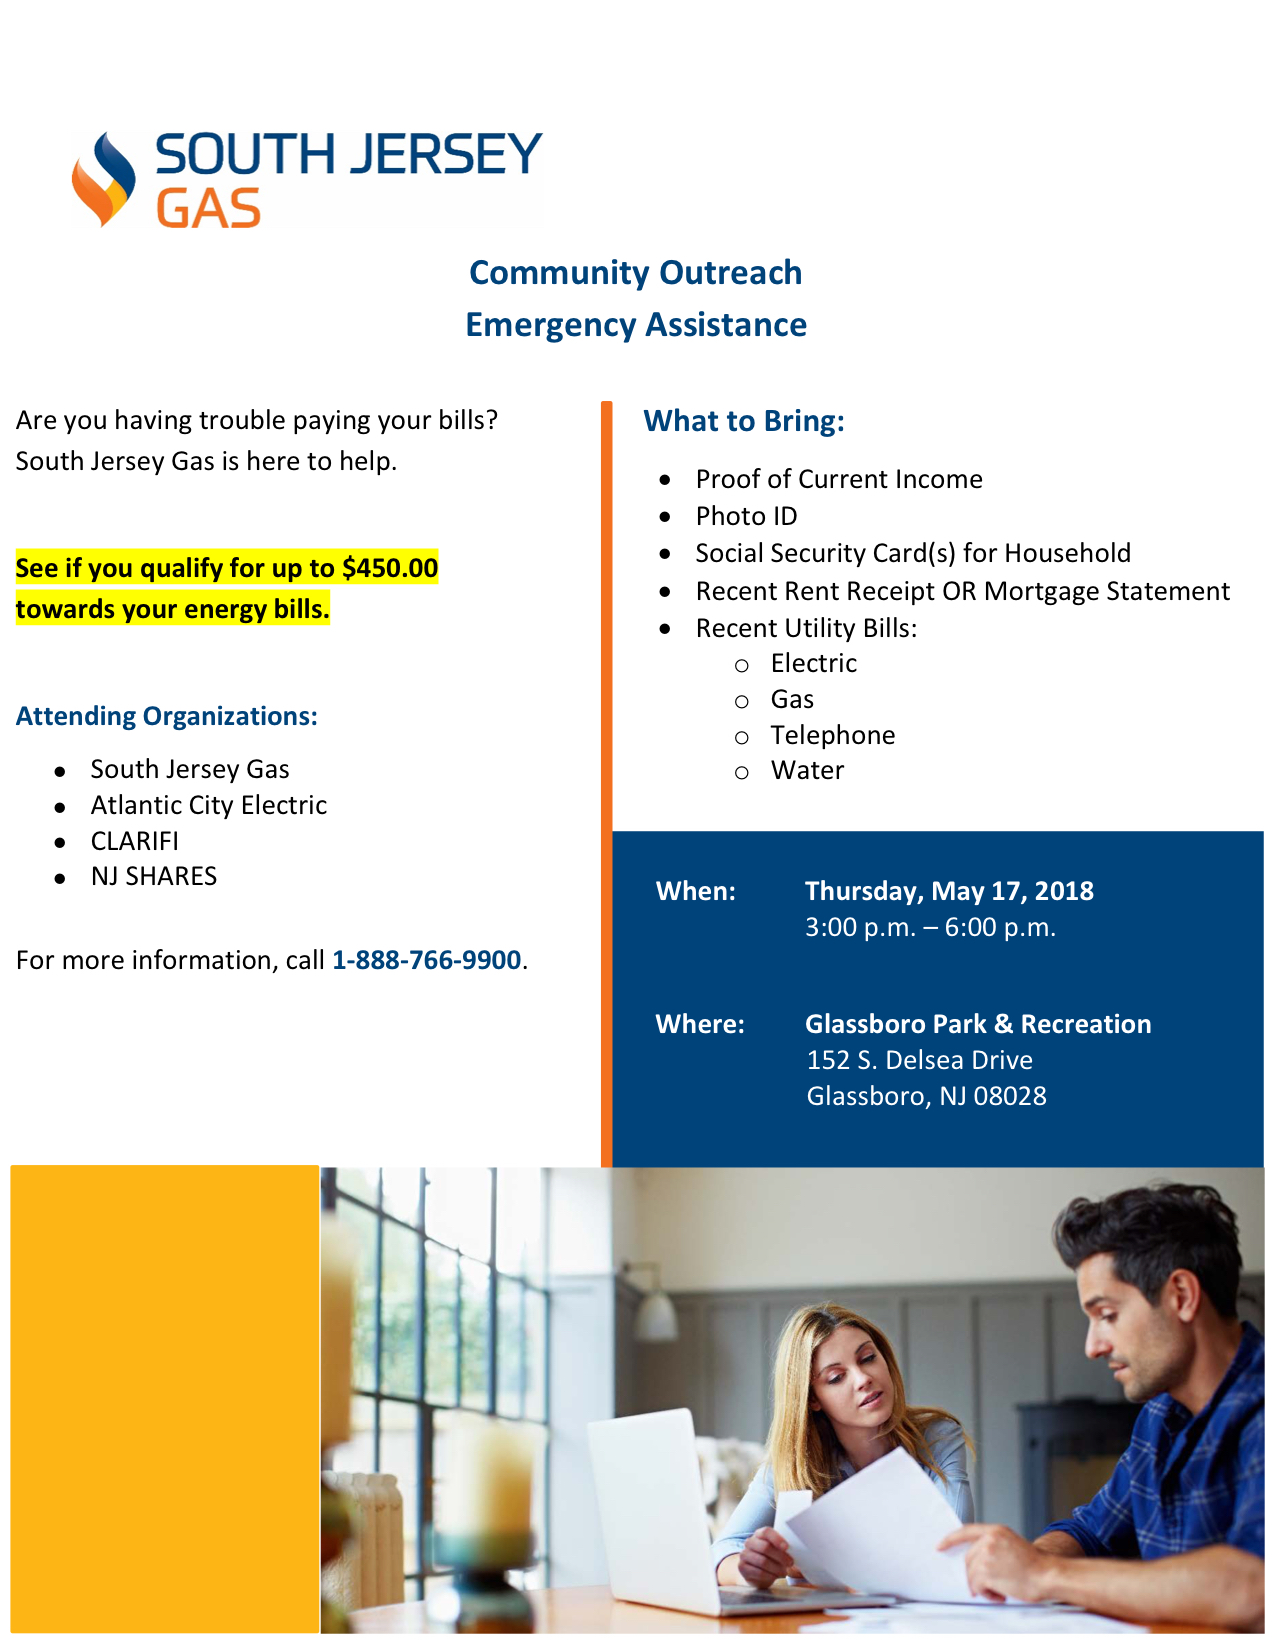 Glassboro Outreach Flyer1.jpeg